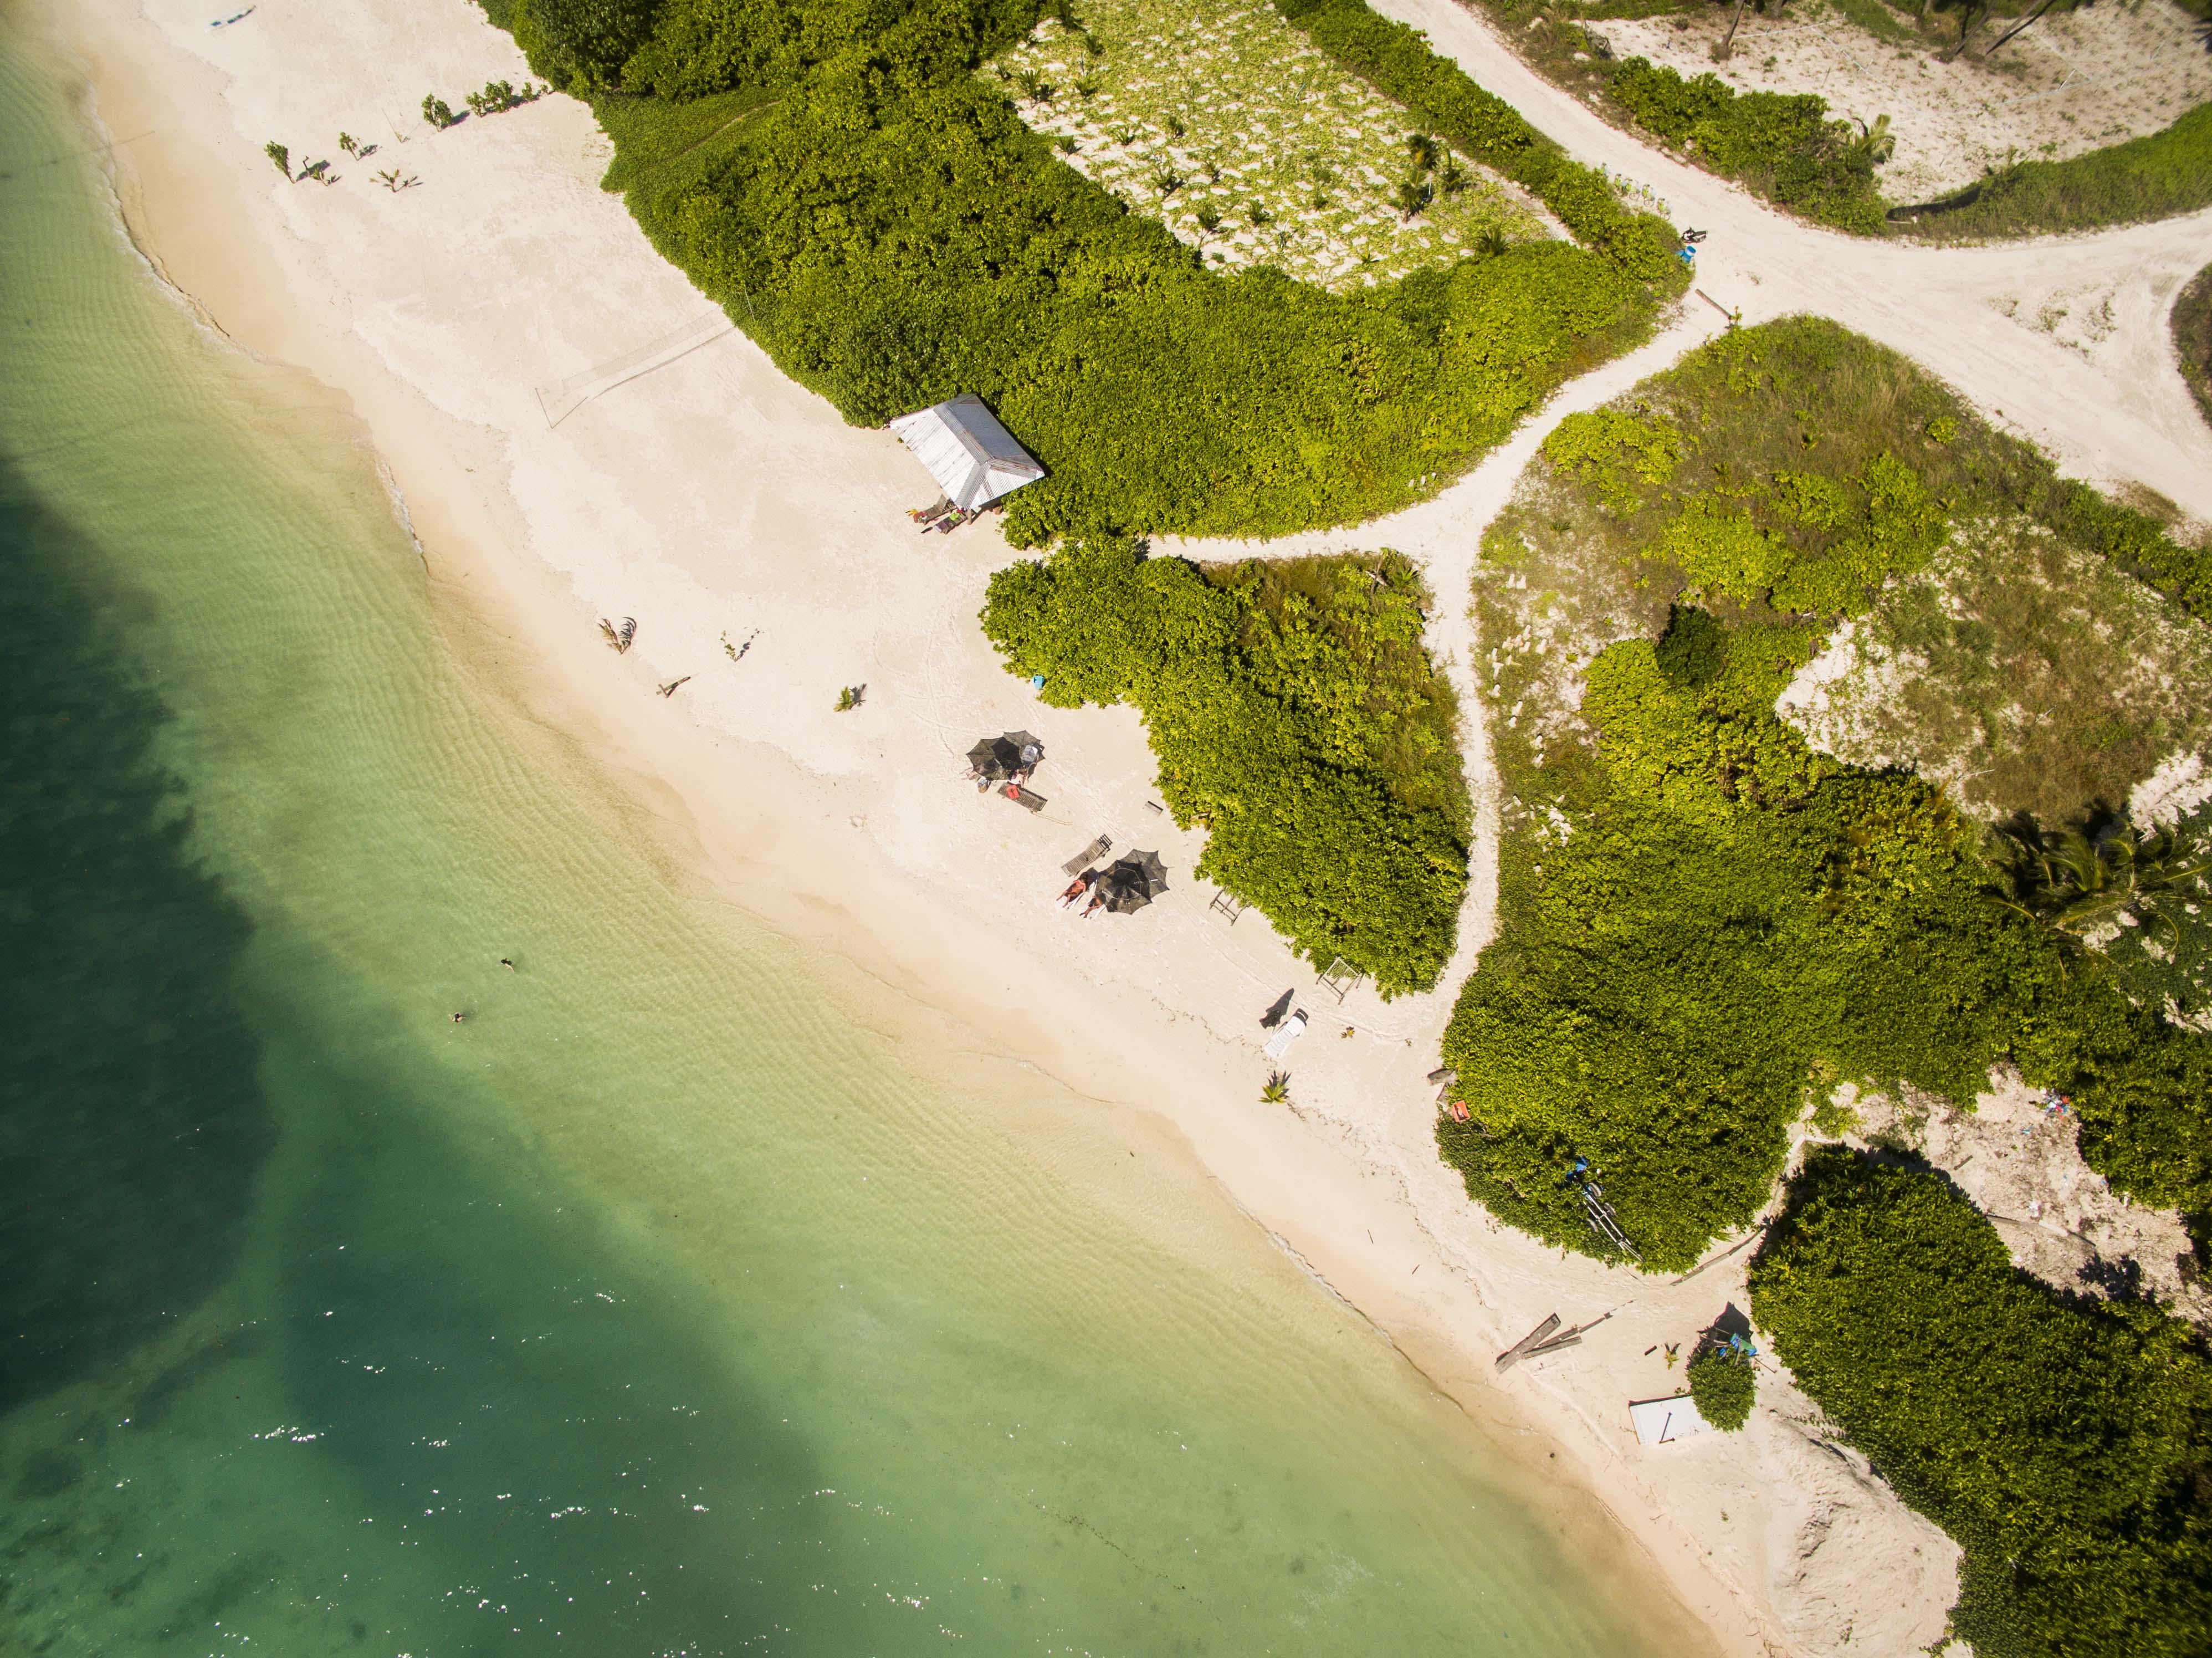 Lacabana Maldives  A Dh Maamigili Island (13)